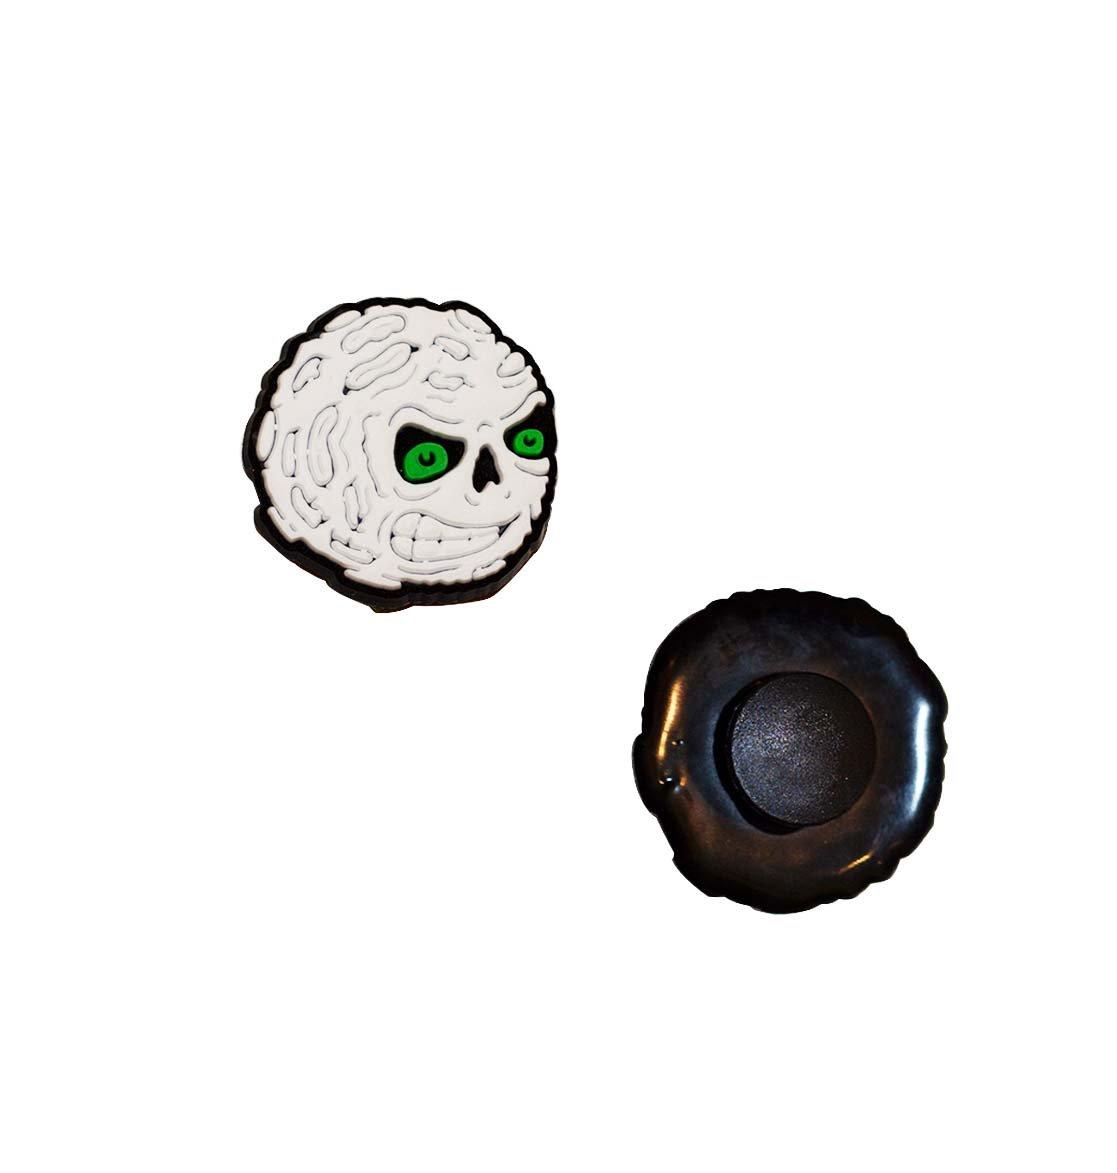 Darkside Angry Moon Croc Charms